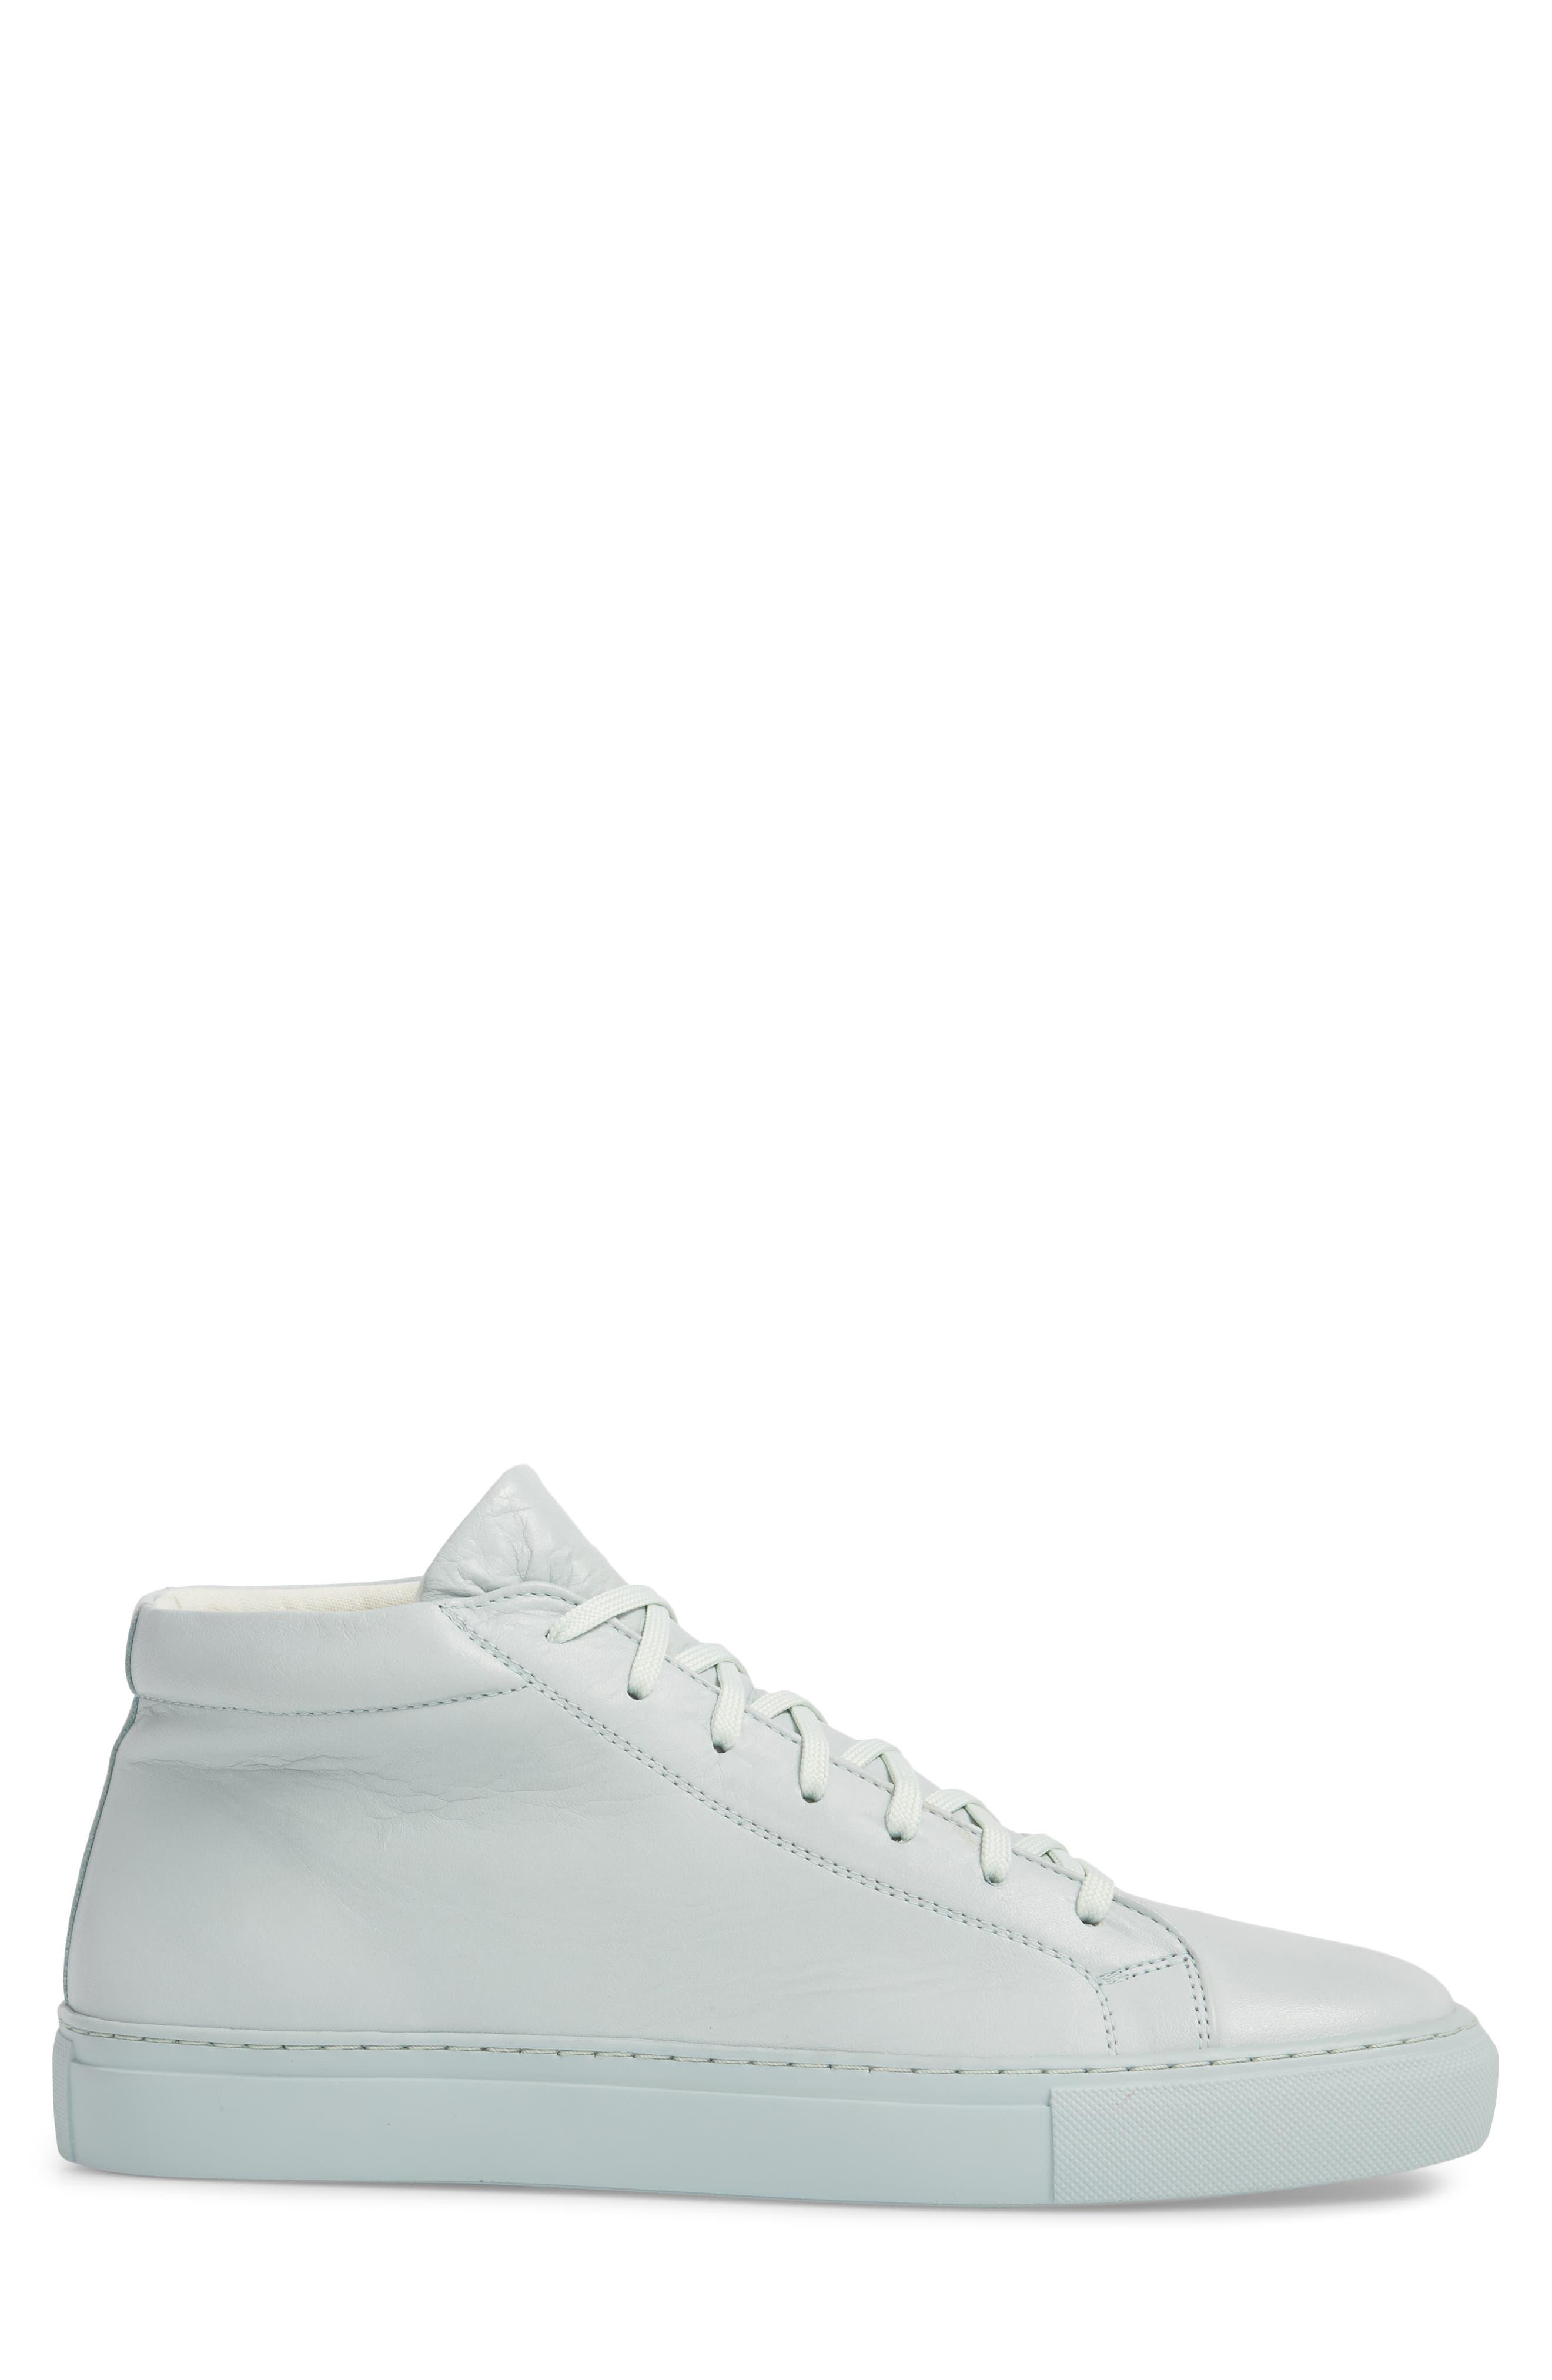 Lexington Mid Top Sneaker,                             Alternate thumbnail 3, color,                             Mint Green Leather